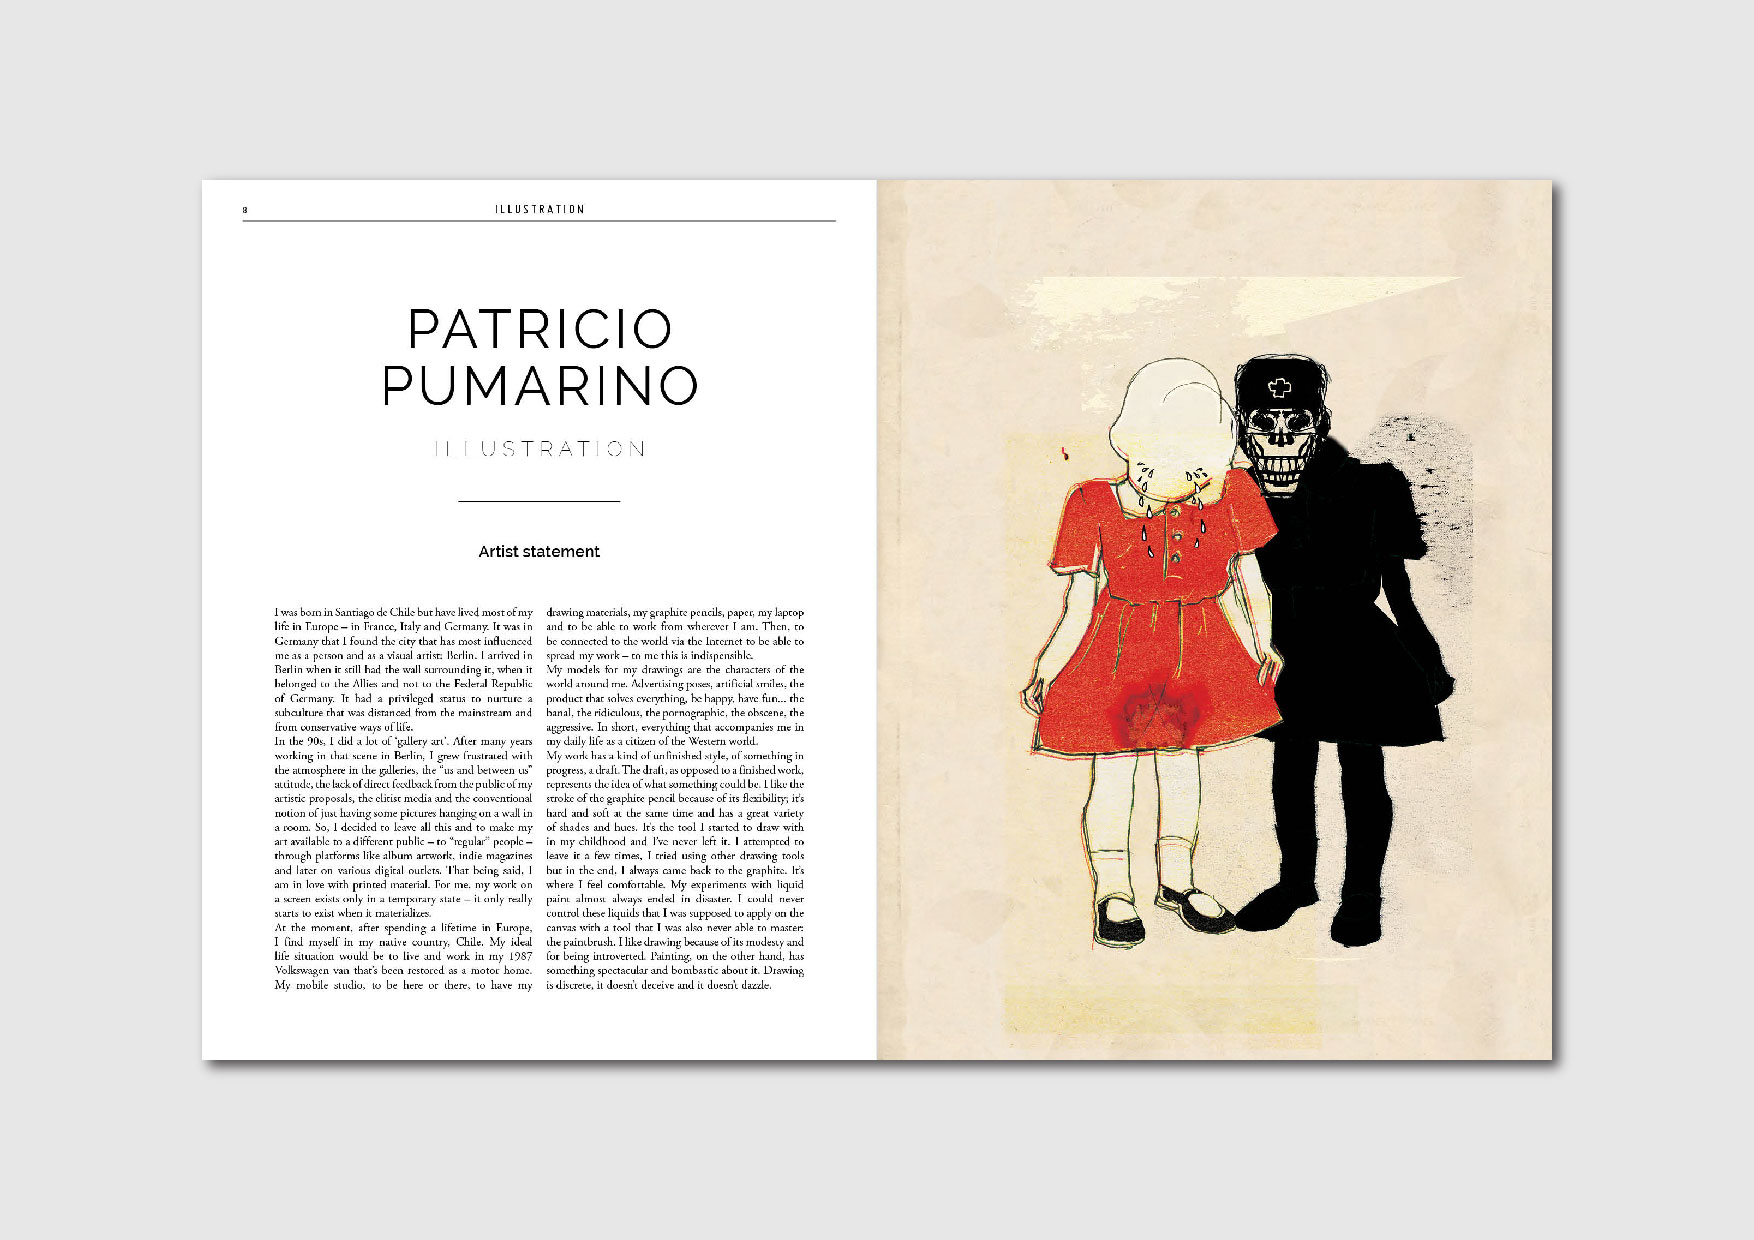 Patricio Pumarino: artist statement and works by the Chilean artist